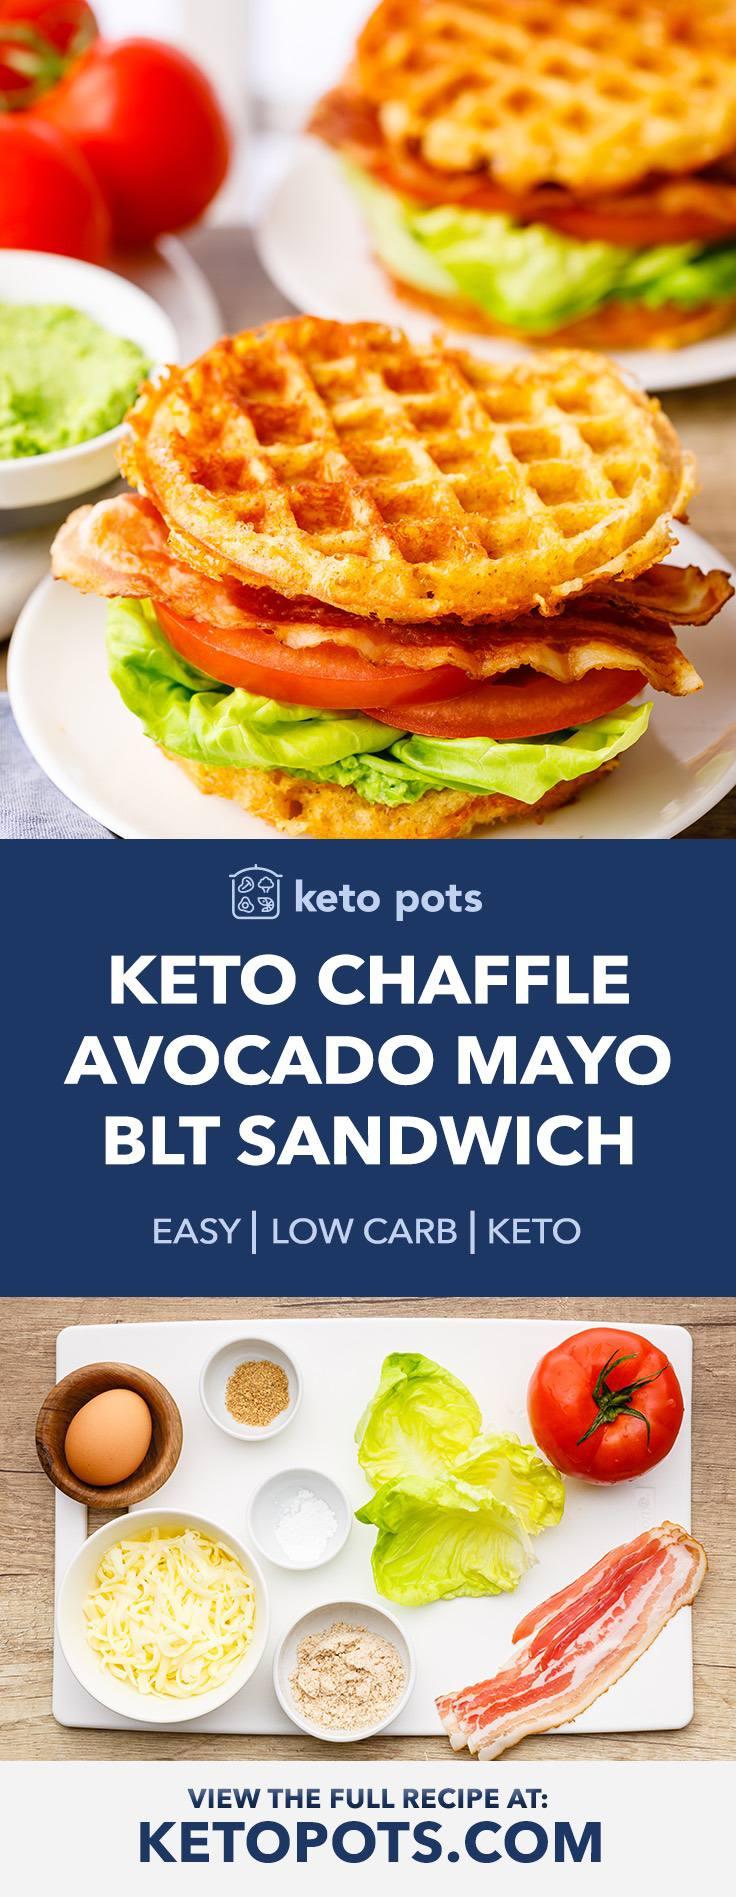 Keto Chaffle BLT Sandwich with Avocado Mayo